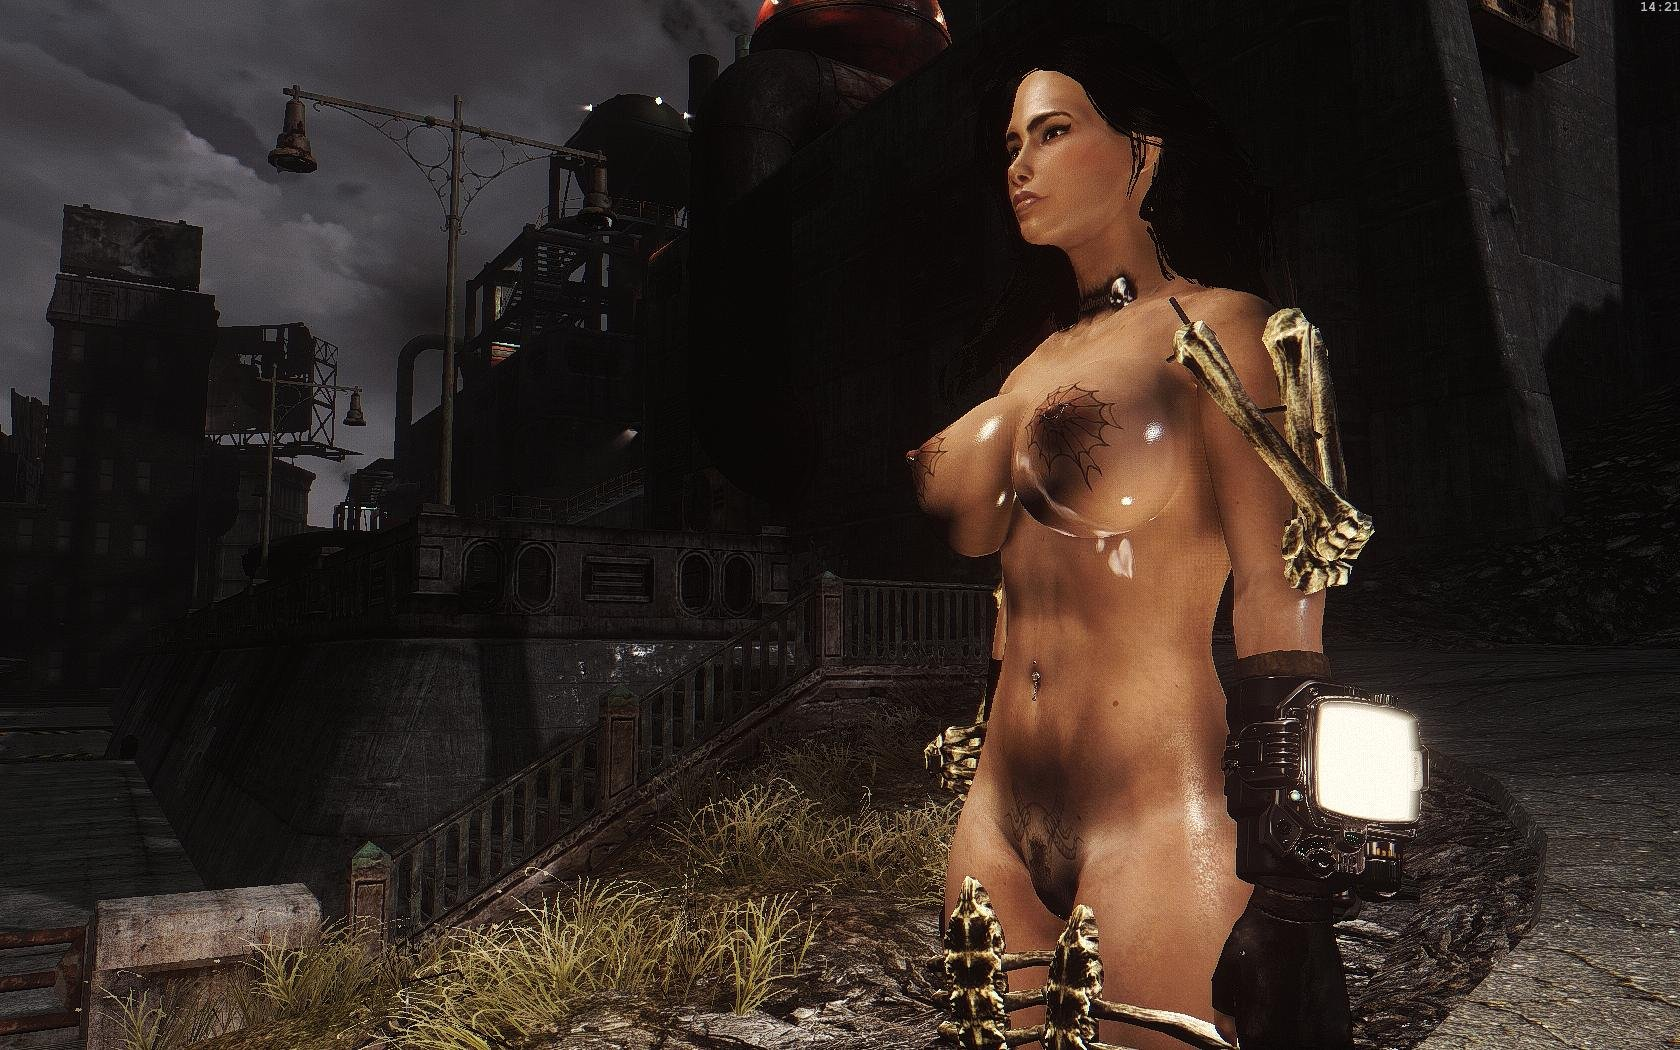 Fallout4 2019-01-05 14-21-42-24